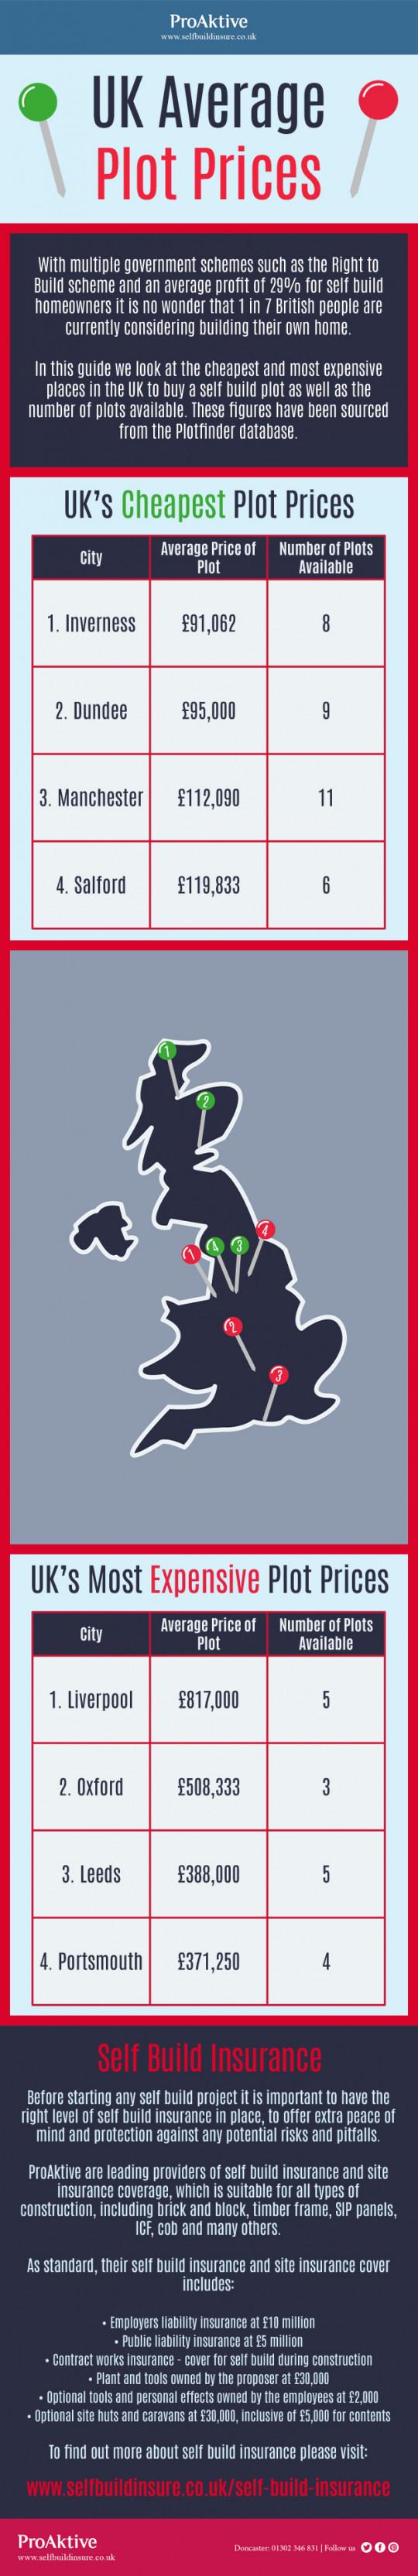 UK Average Plot Prices